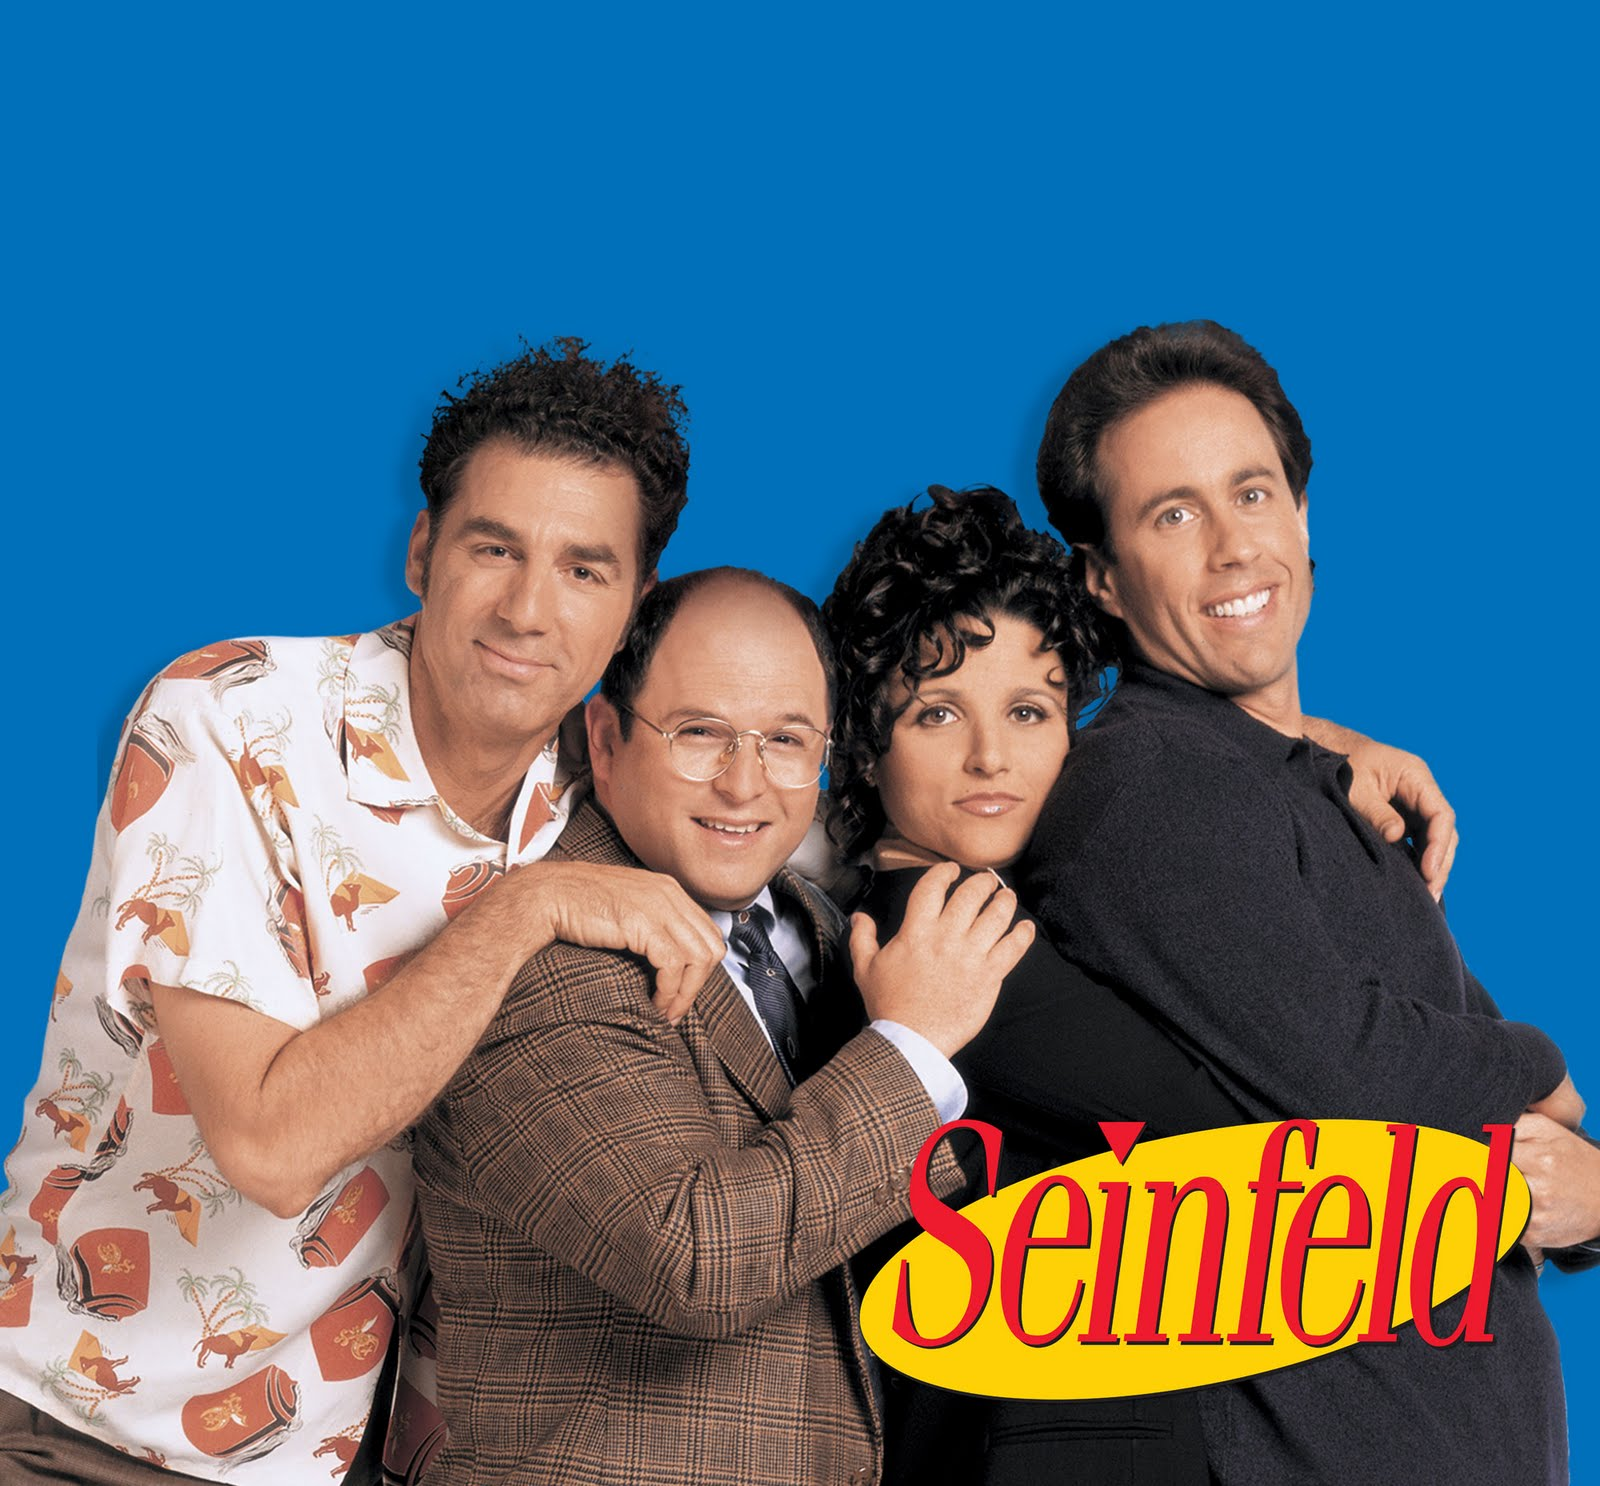 http://4.bp.blogspot.com/_dnBUTaw5i1o/TJfoMNJK2VI/AAAAAAAAAXo/fYg710AeRyw/s1600/Seinfeld.jpg